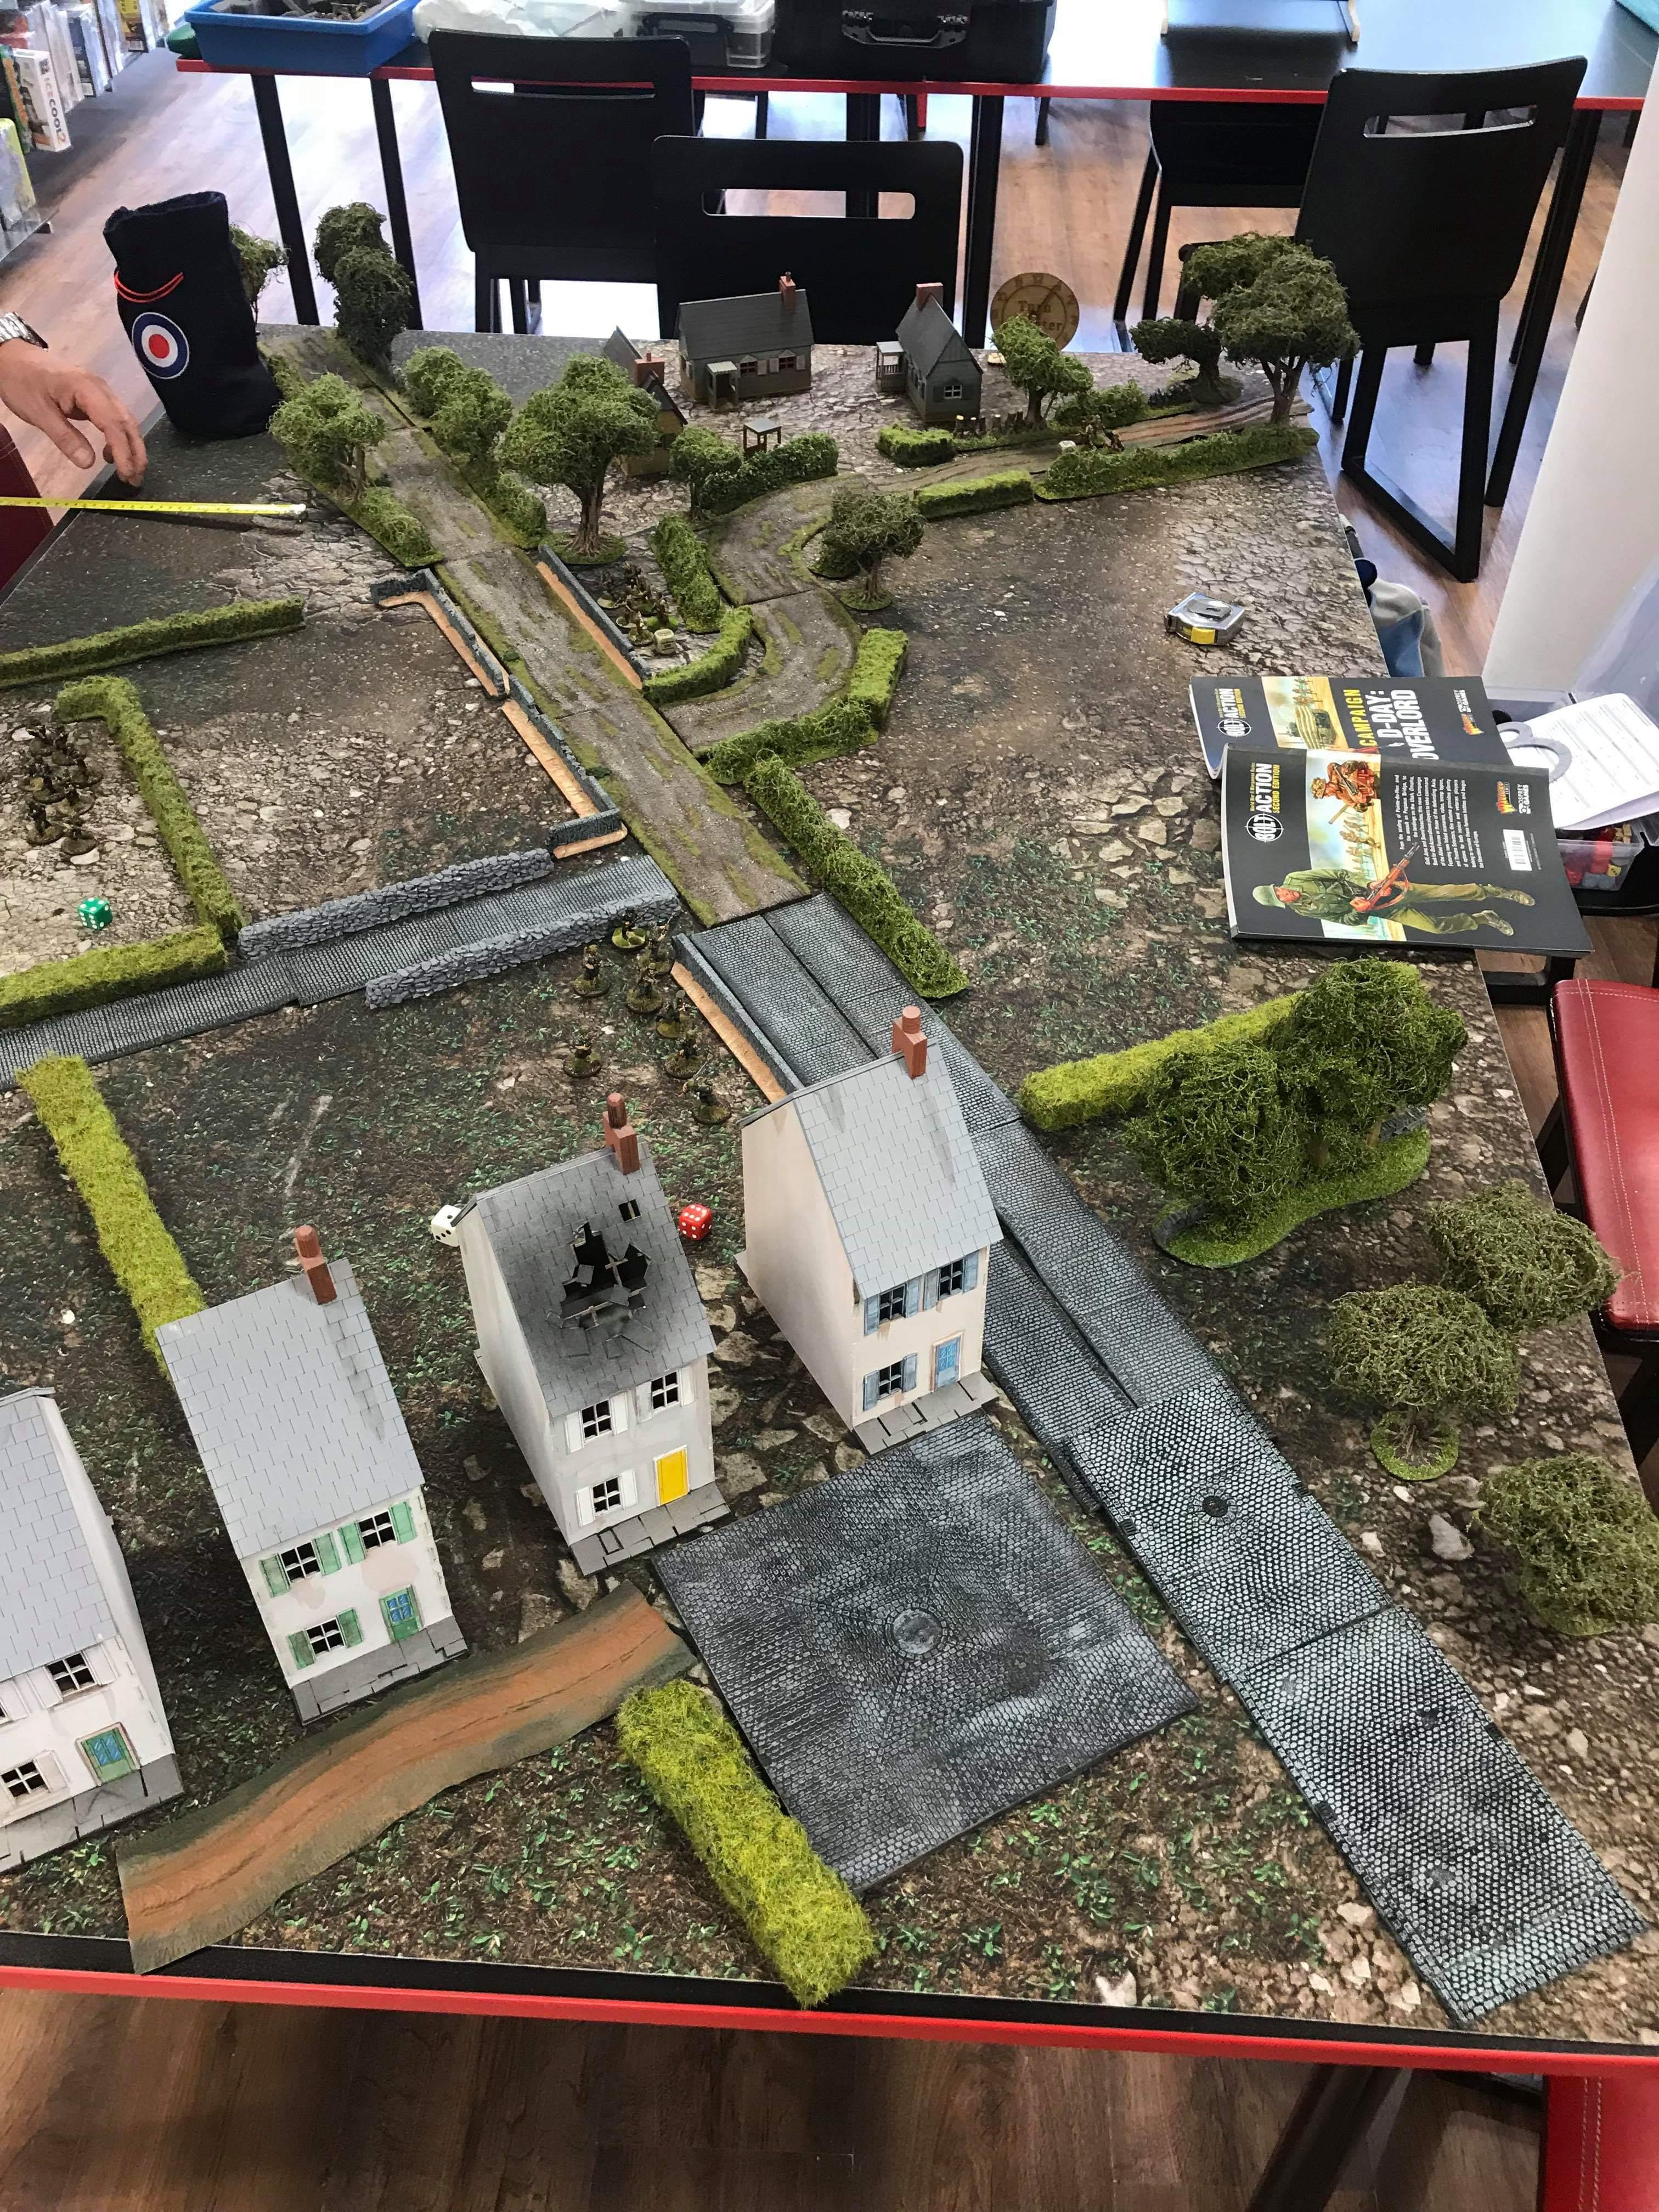 Jommes d'honneur versus Klopps company in a fierce infantry engagement